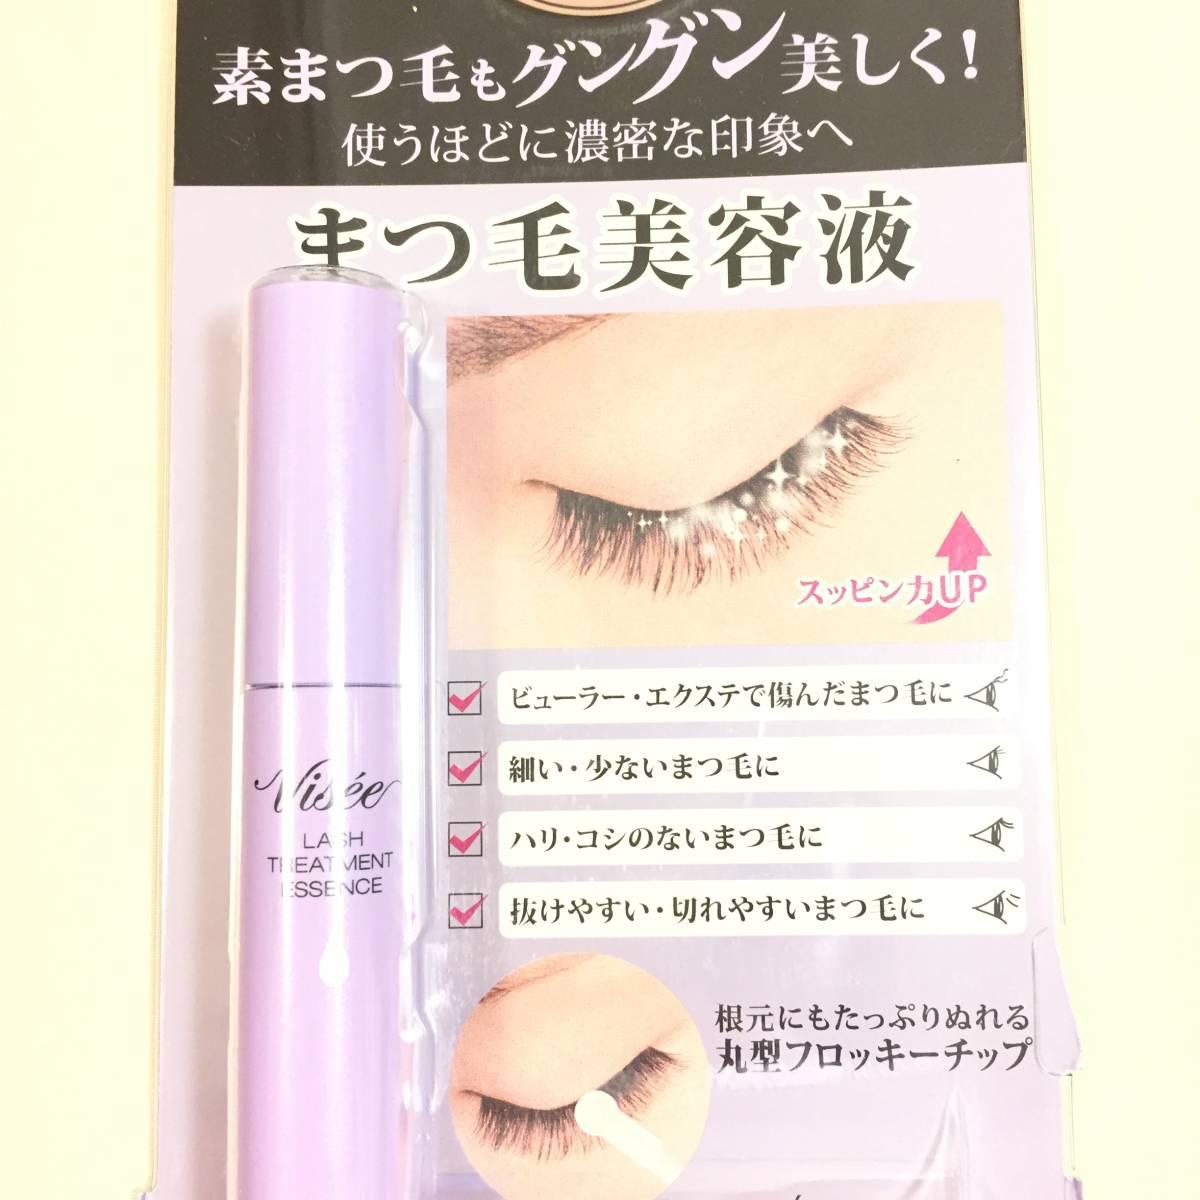 new goods *VISEE( Visee )lishe Rush treatment essence ( eyelashes beauty care liquid )*